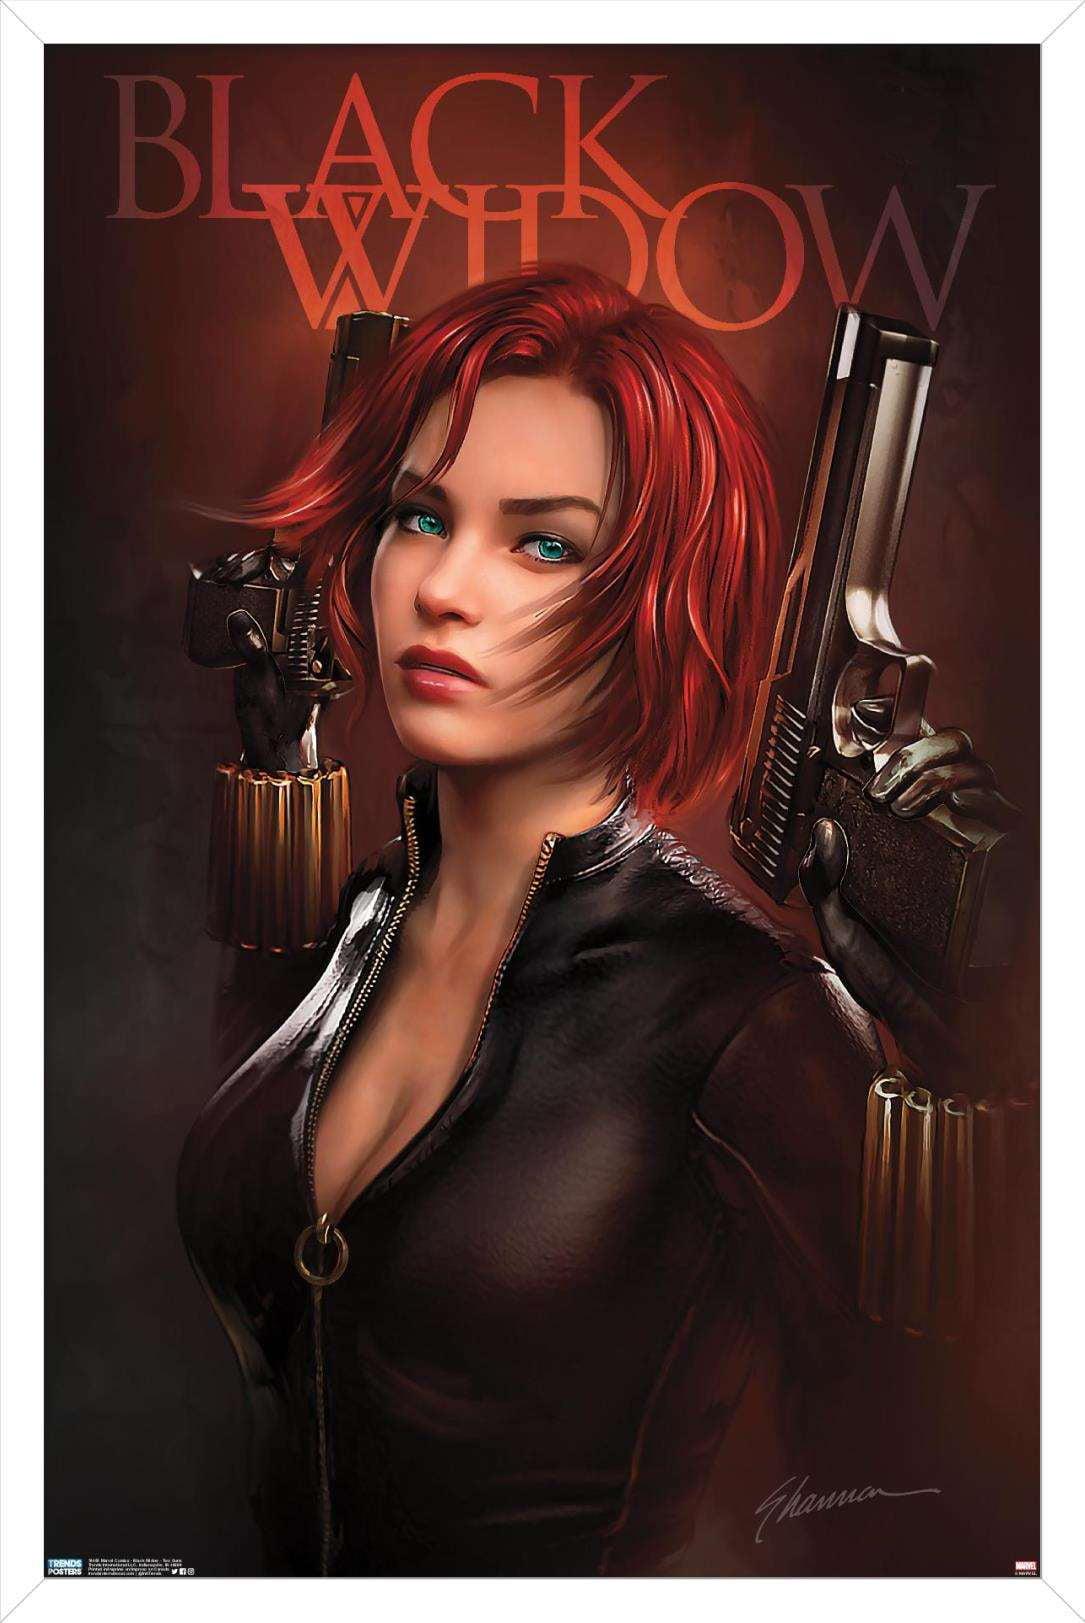 Marvel Comics - Black Widow - Two Guns Poster - Walmart.com - Walmart.com